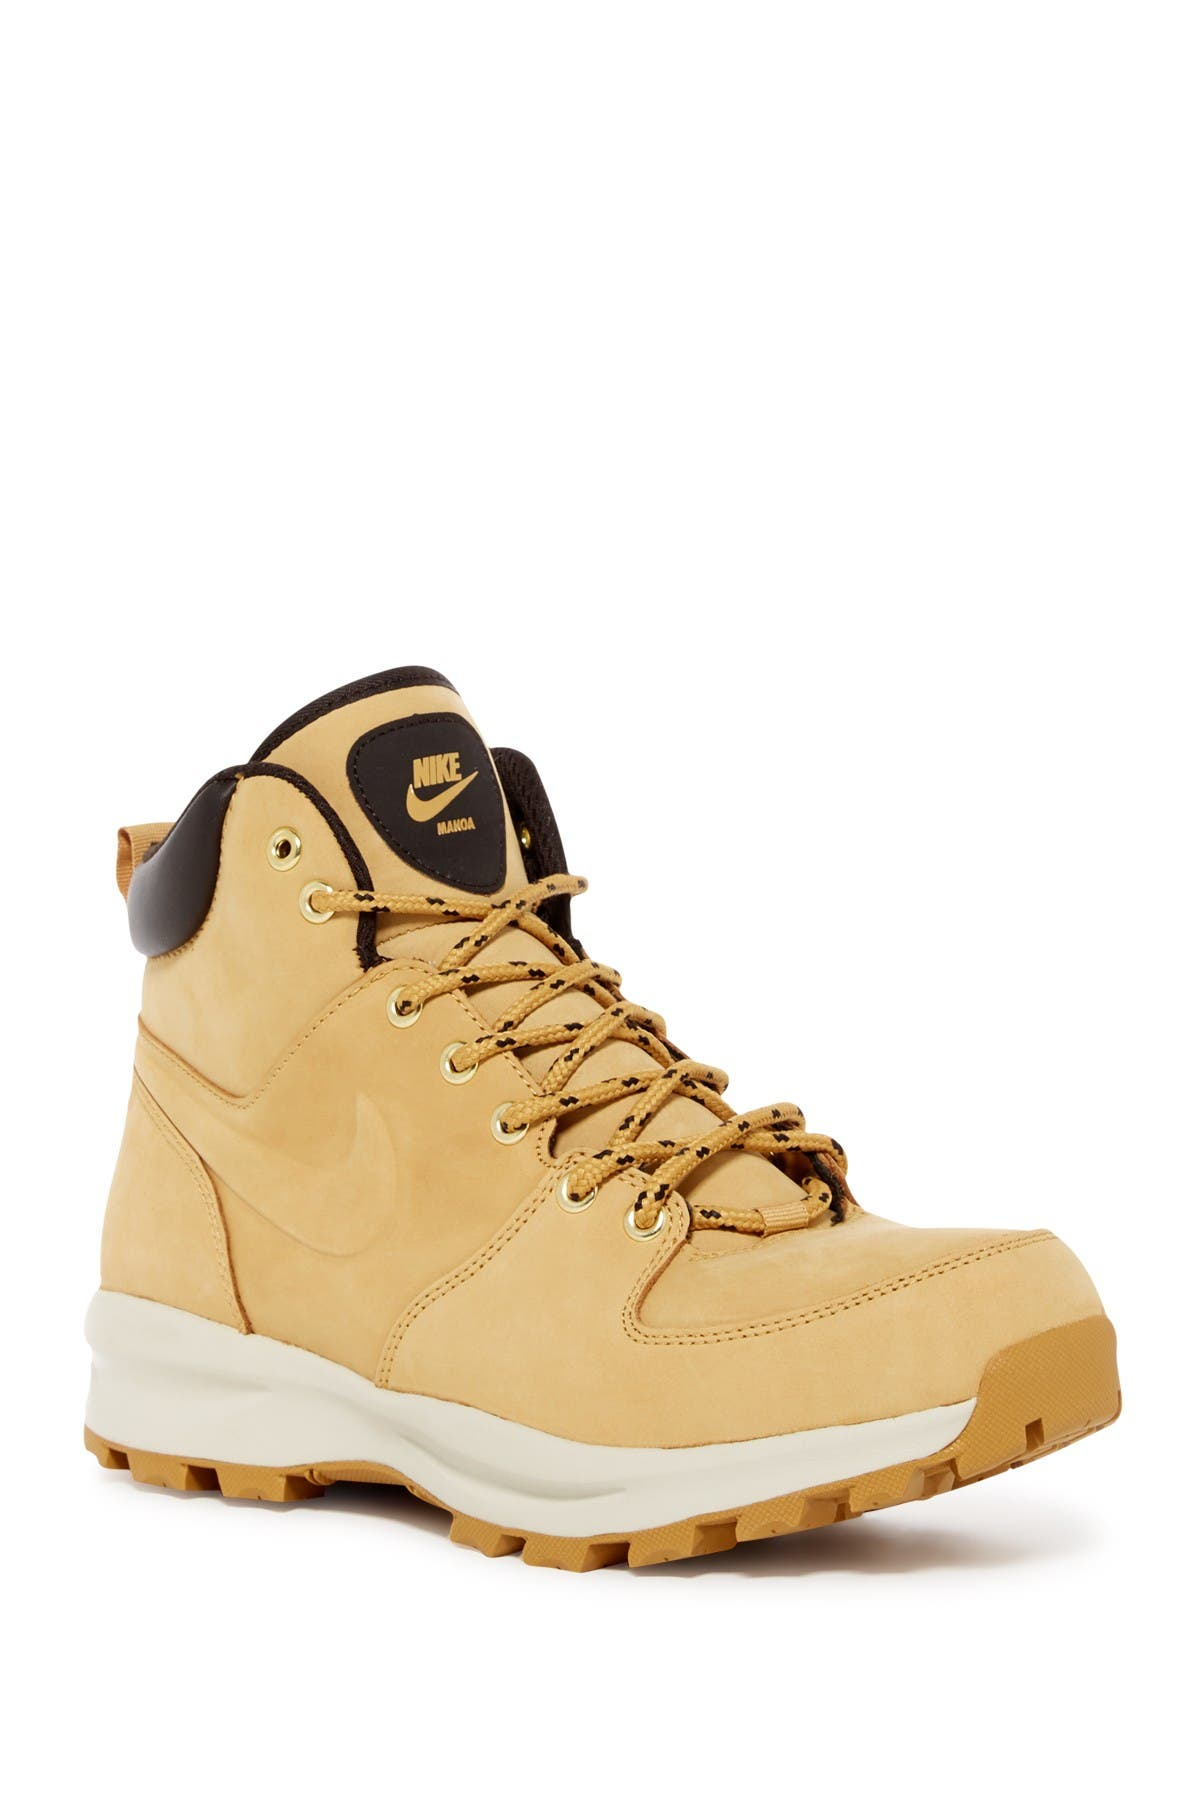 Image of Nike Manoa Boot